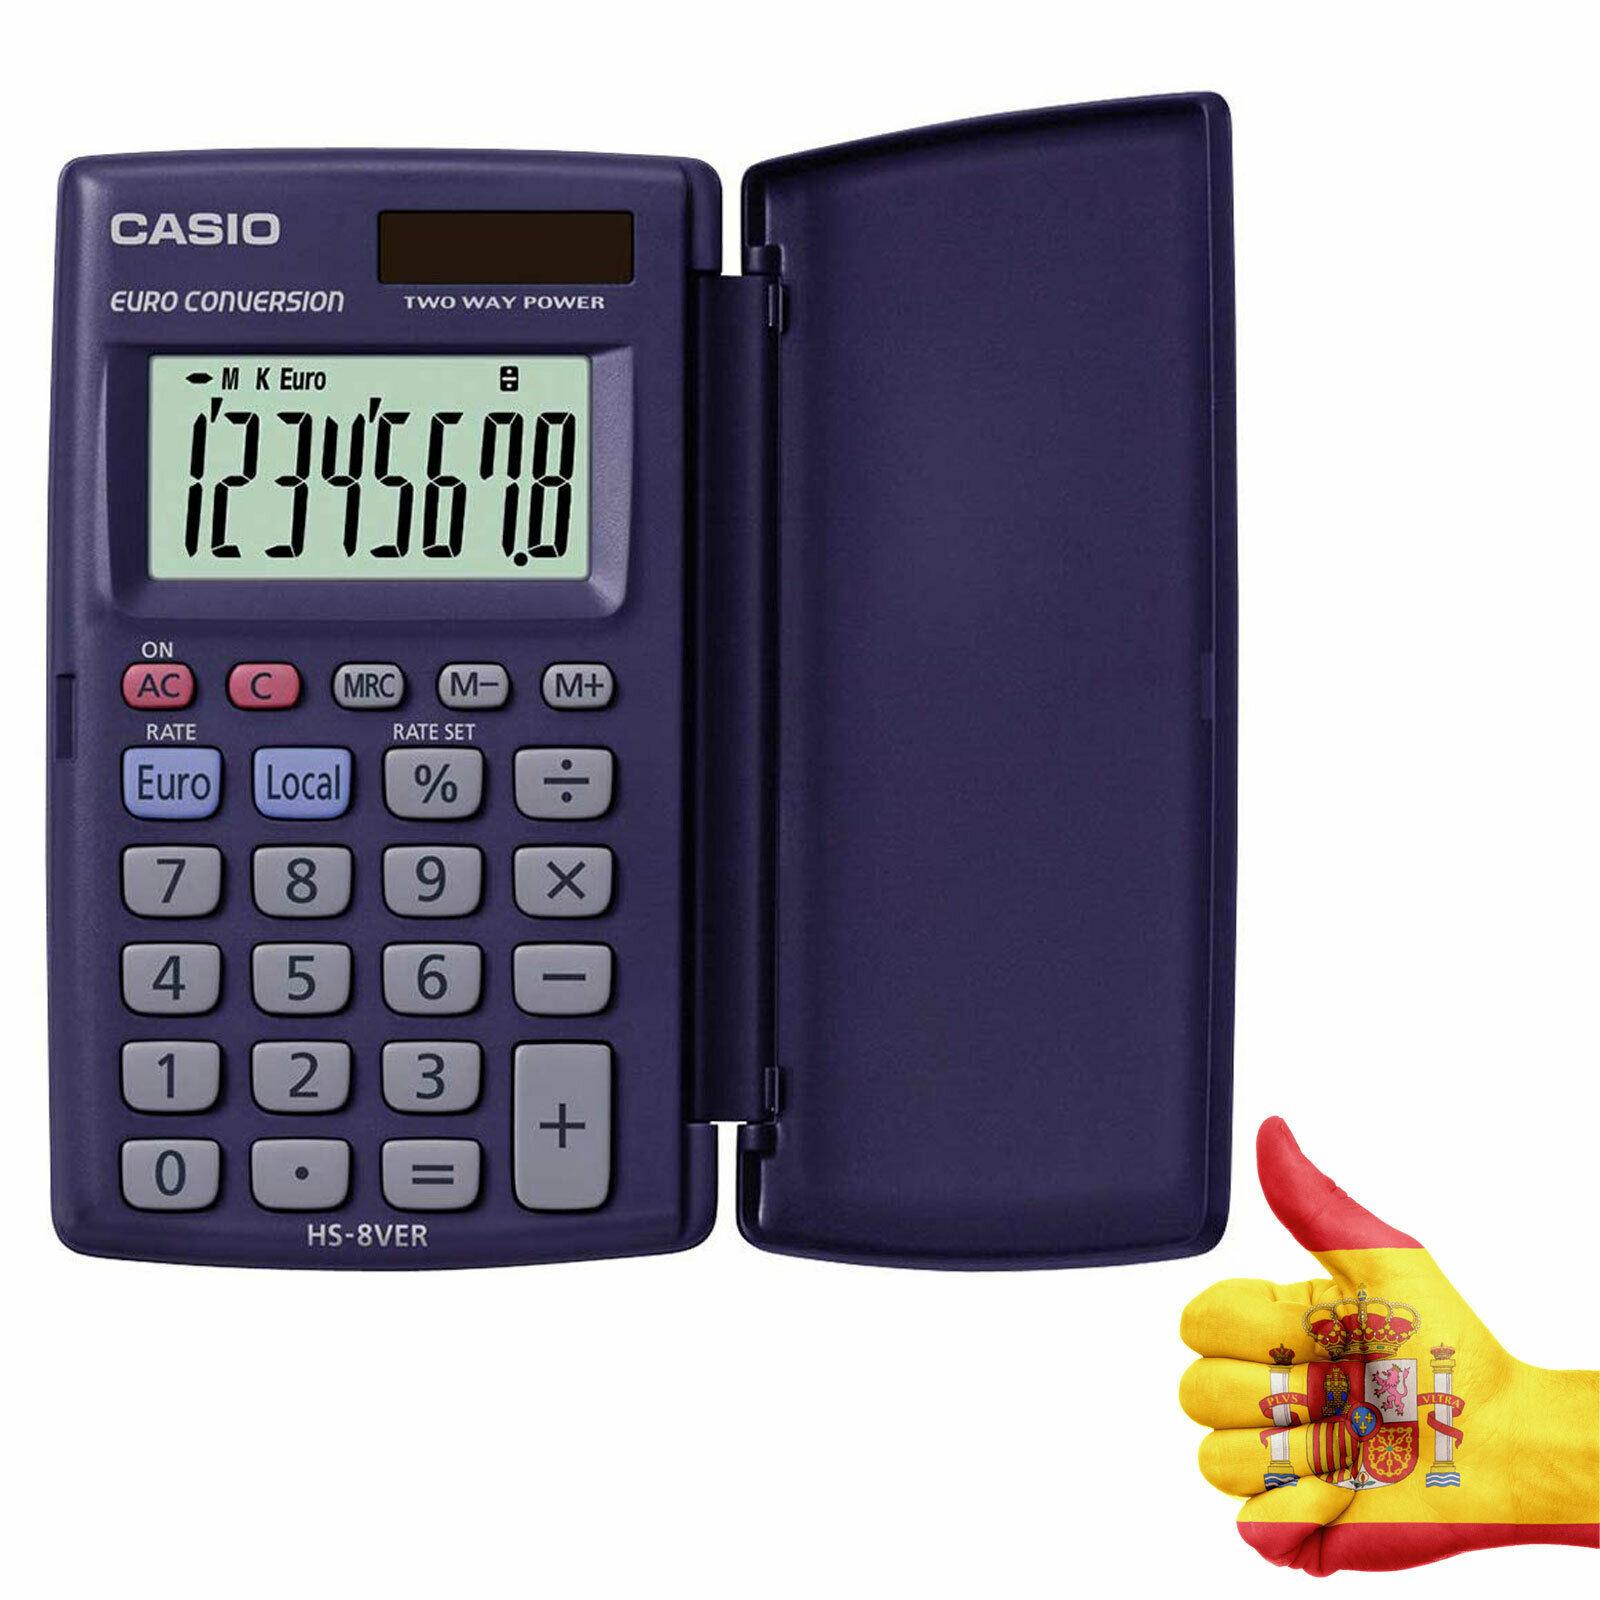 POCKET CALCULATOR 8 DIGIT CASIO HS-8VER School Student School Children